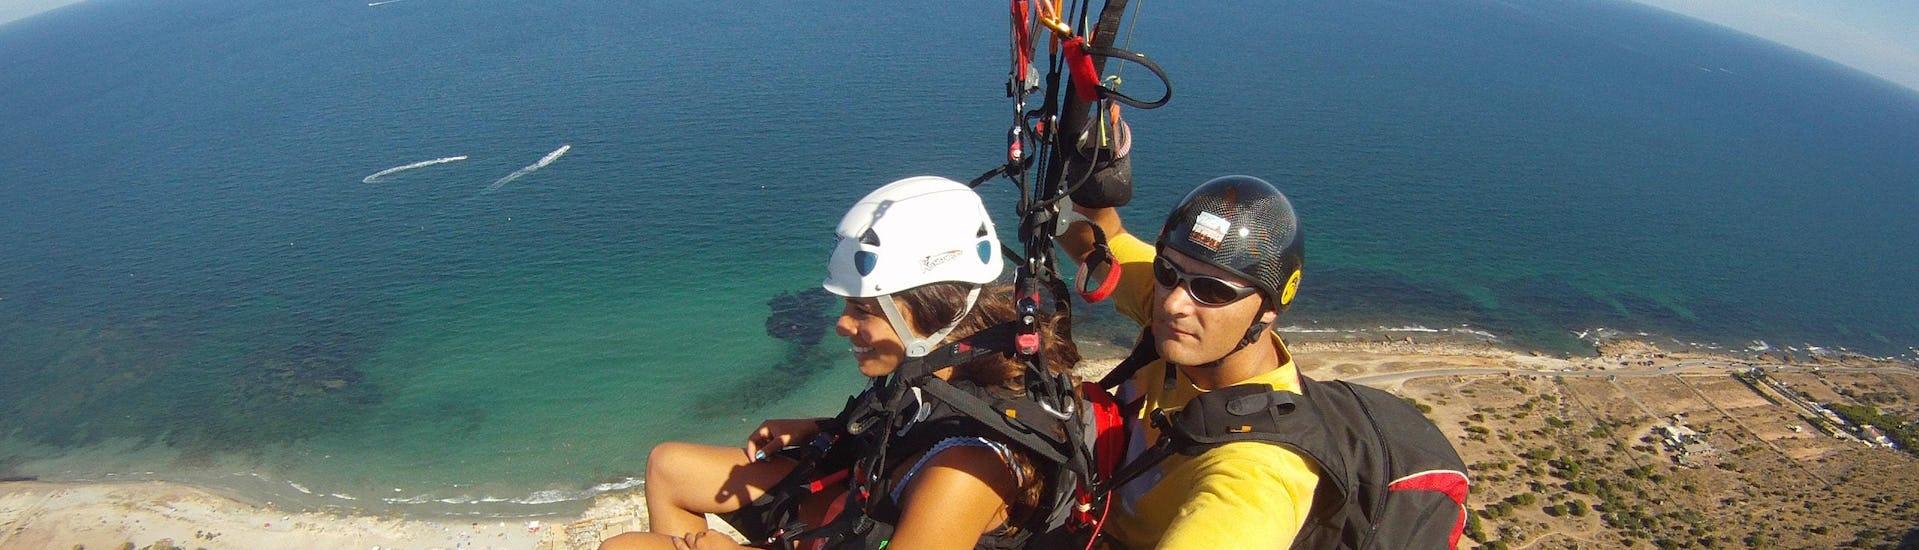 "Tandem Paragliding ""Panorama Flight"" - Costa Blanca"